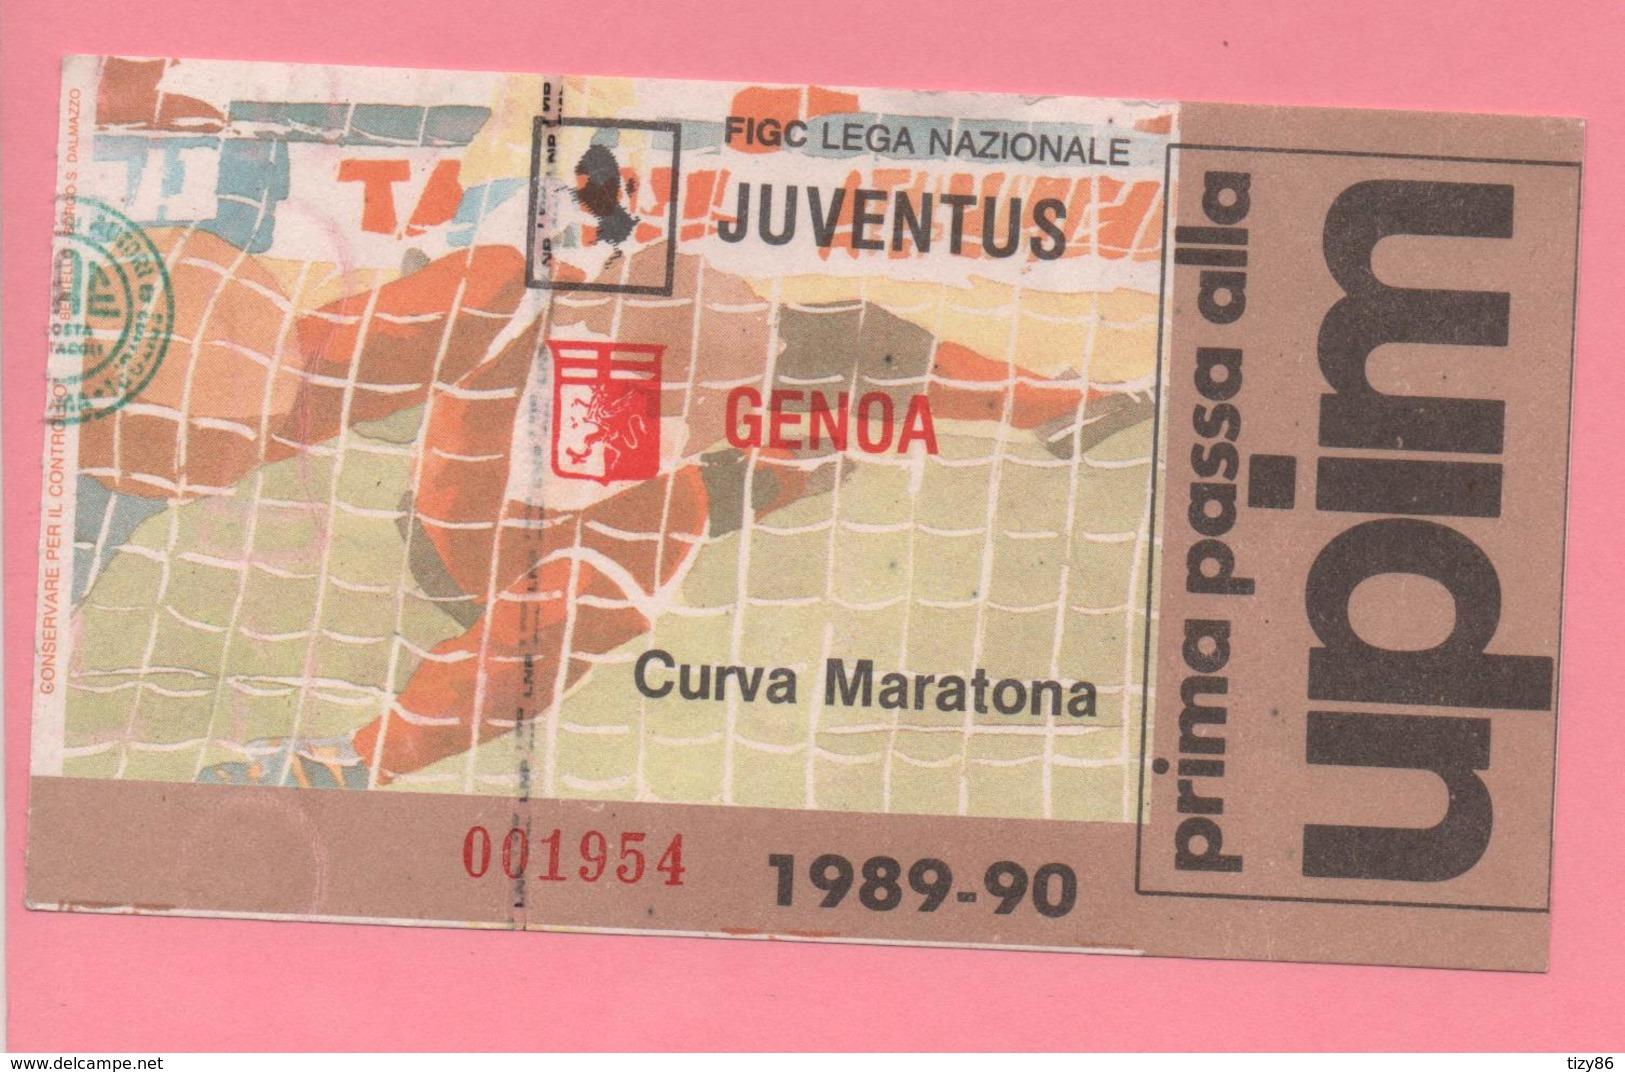 Biglietto D'ingresso Stadio Torino Juventus Genoa 1989/90 - Tickets D'entrée